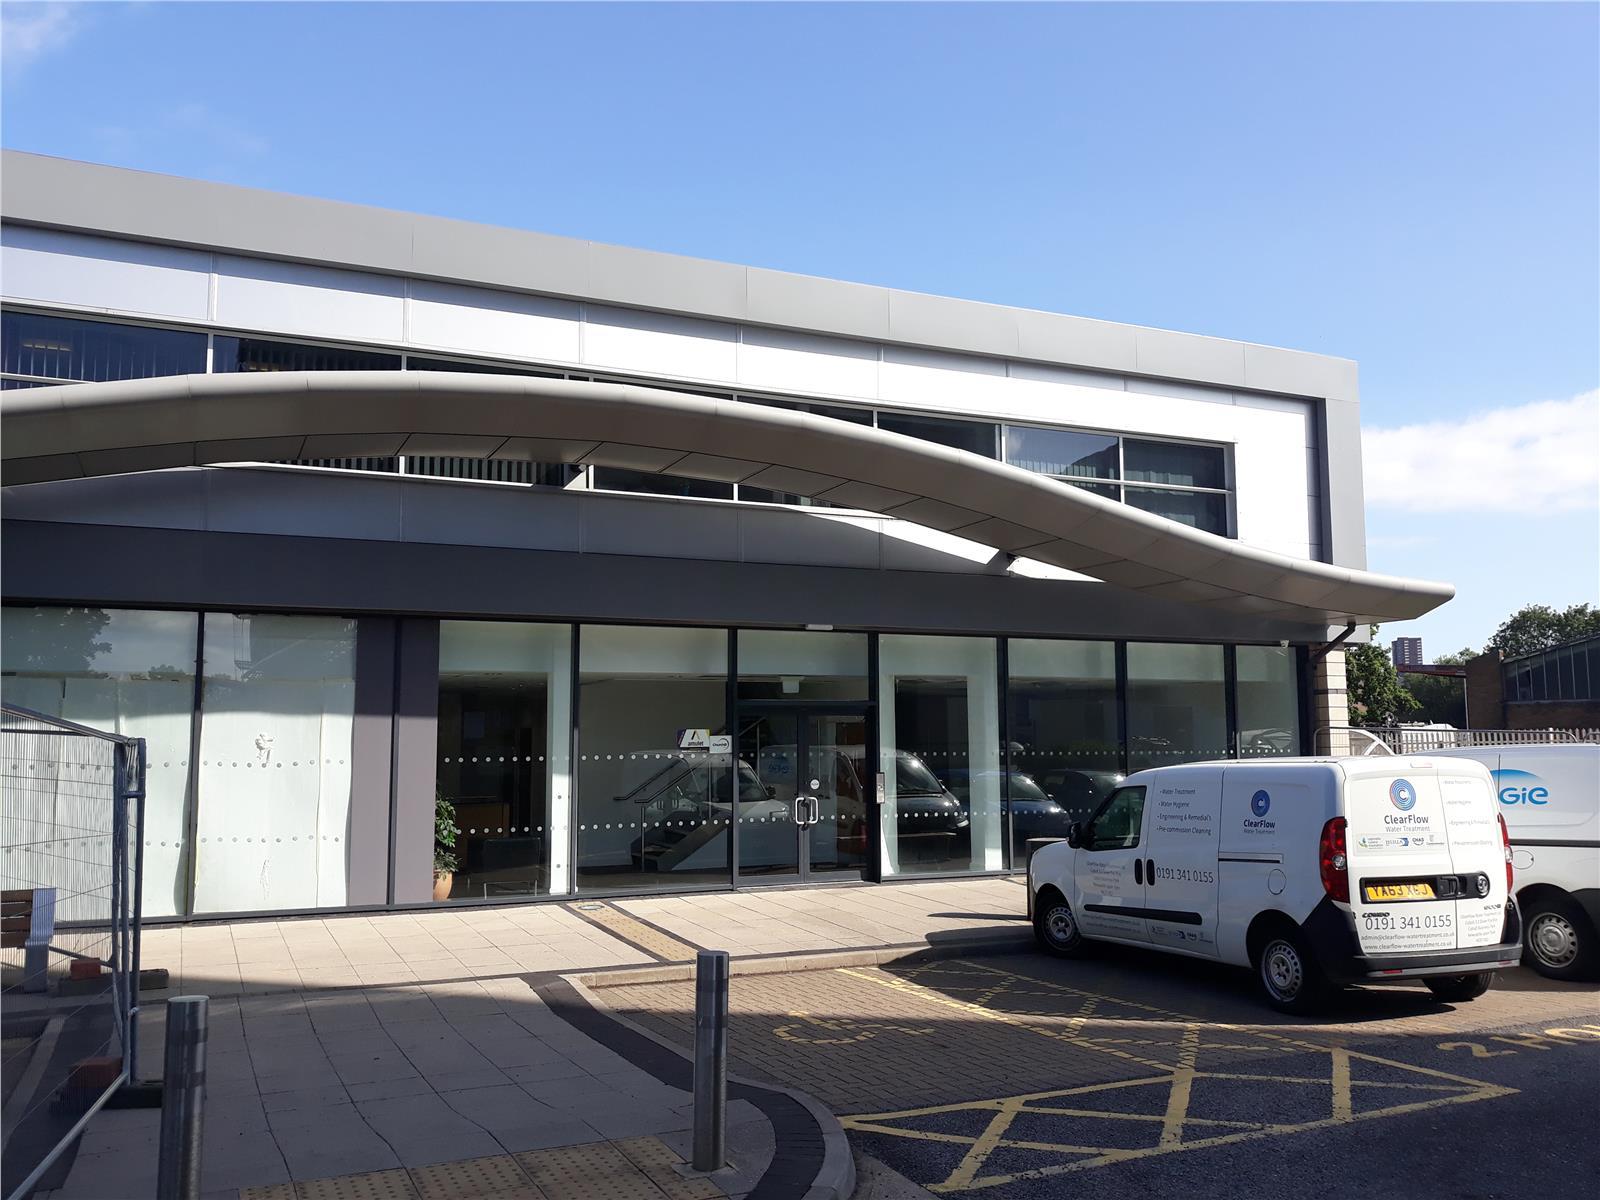 Ground & First Floor, Maingate, Kingsway, Team Valley Trading Estate, Gateshead, Tyne & Wear, NE11